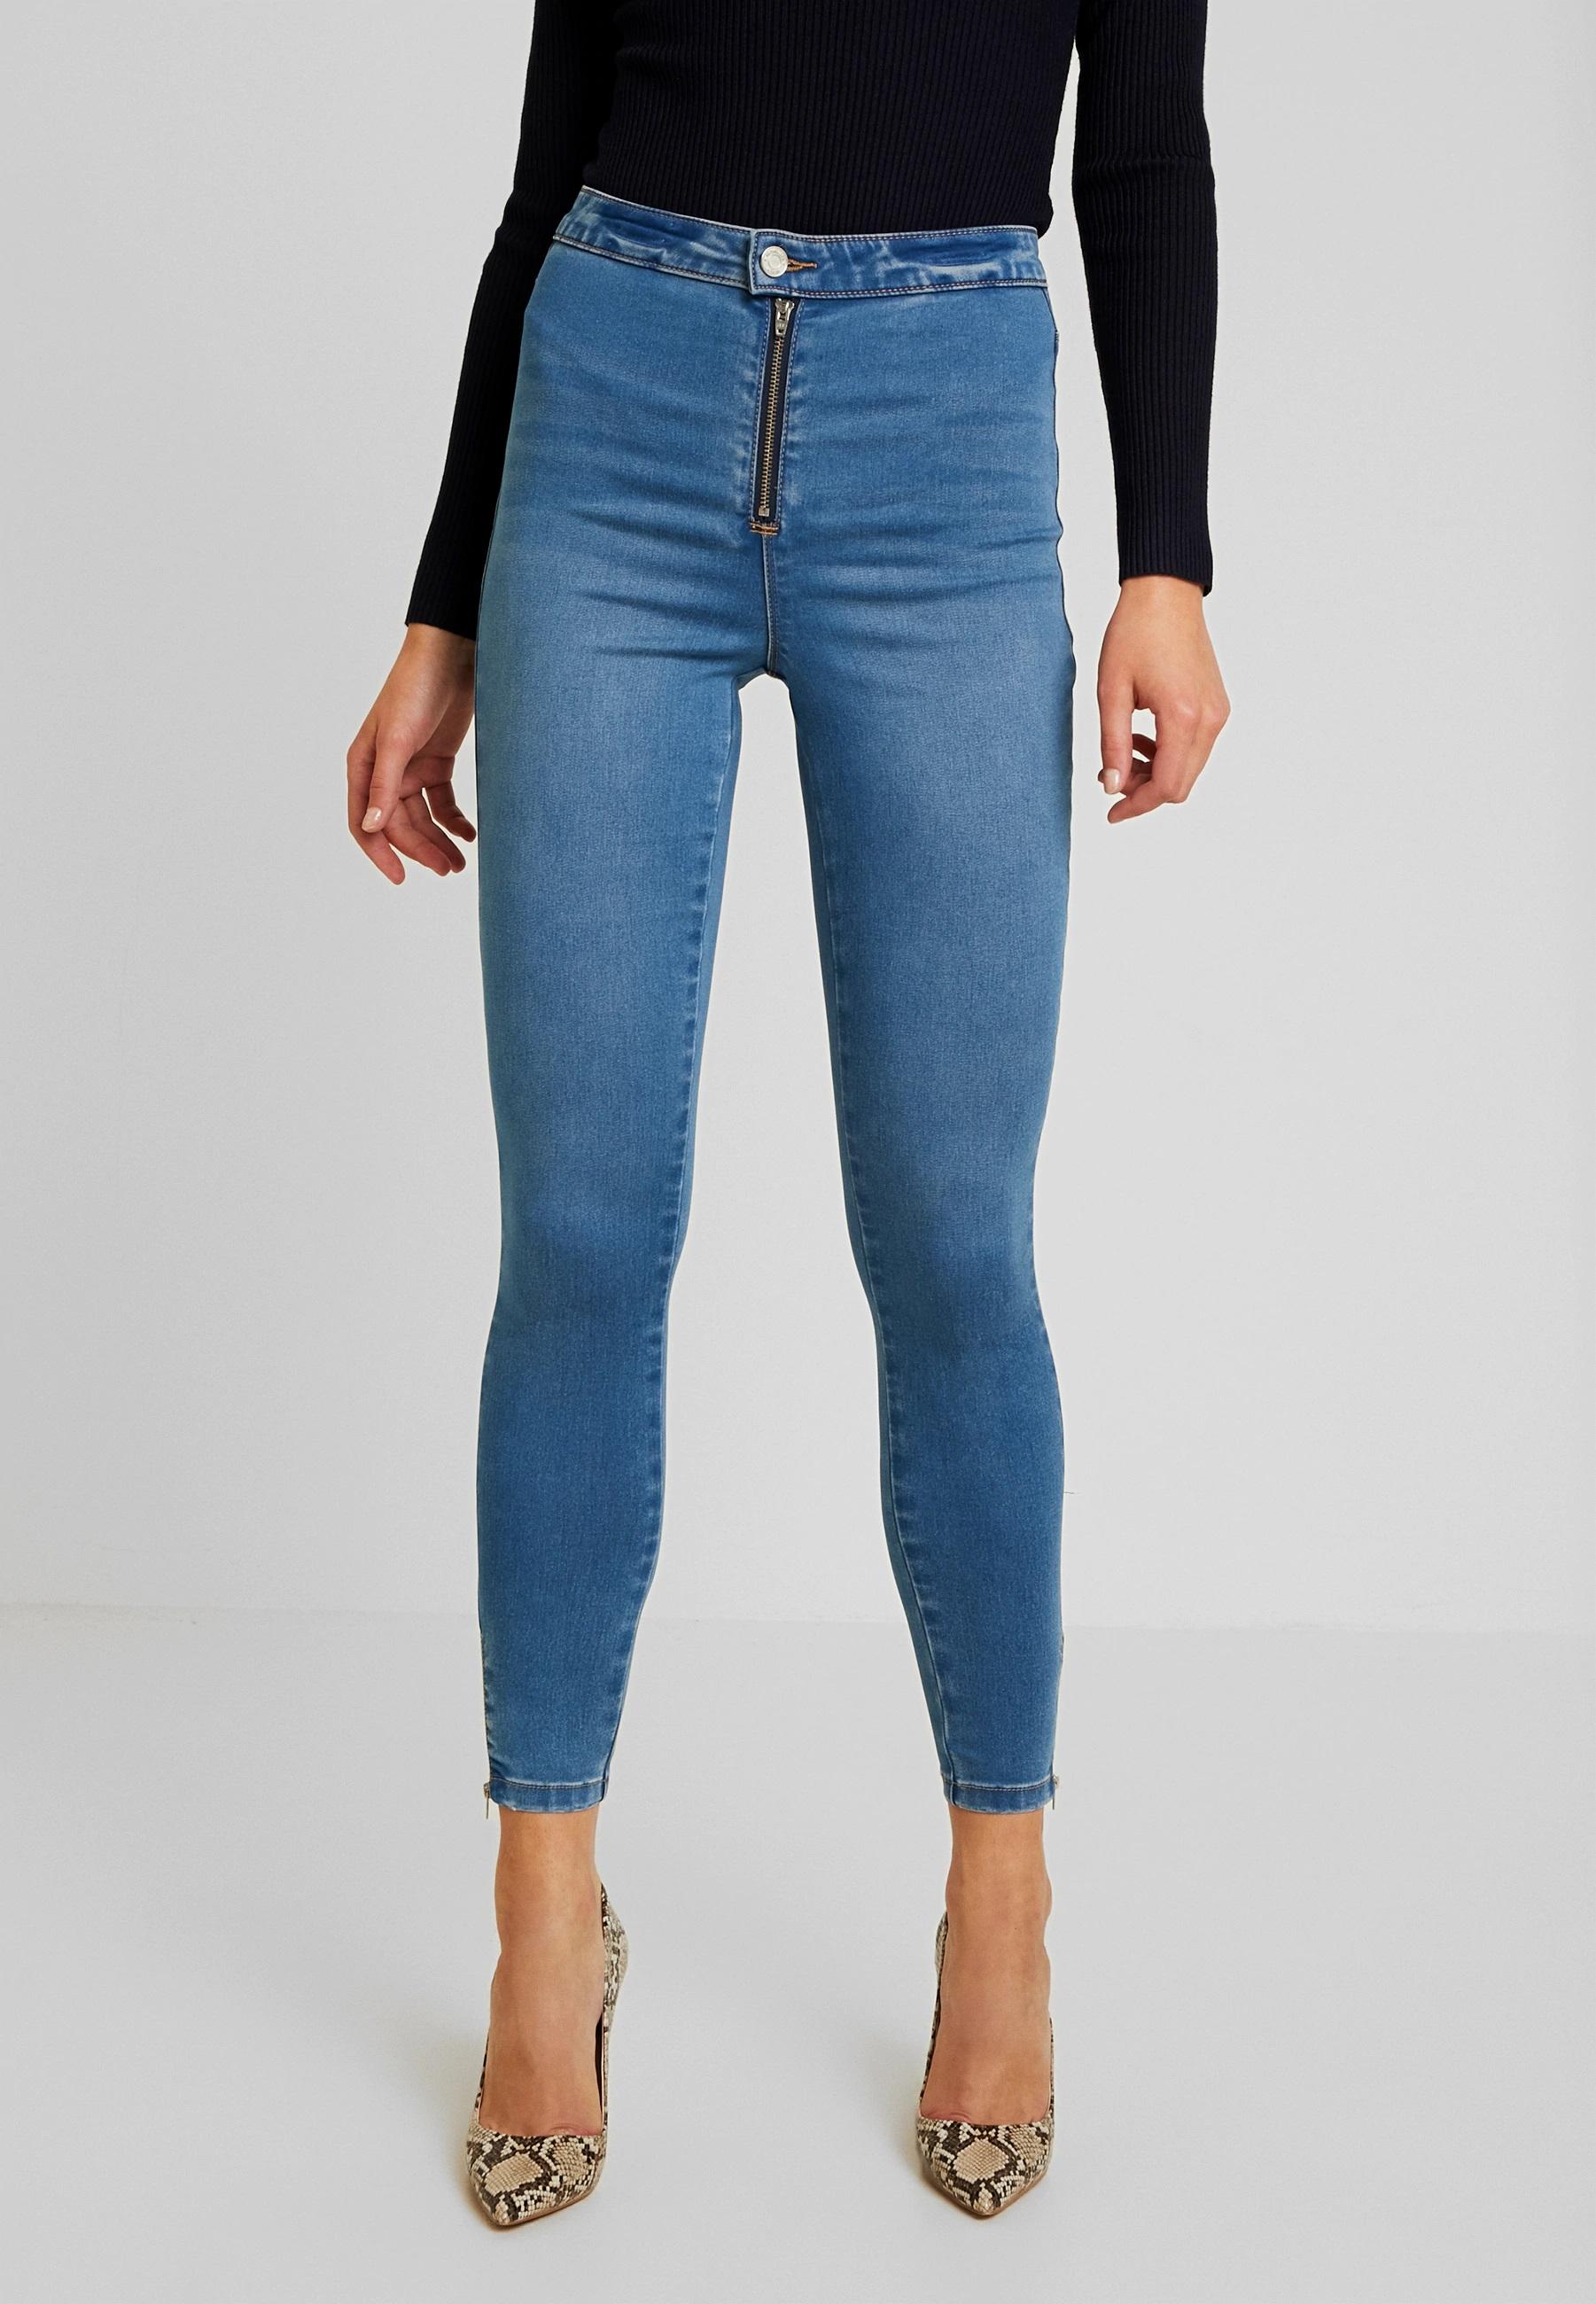 Jeans con cremallera frontal de Missguided